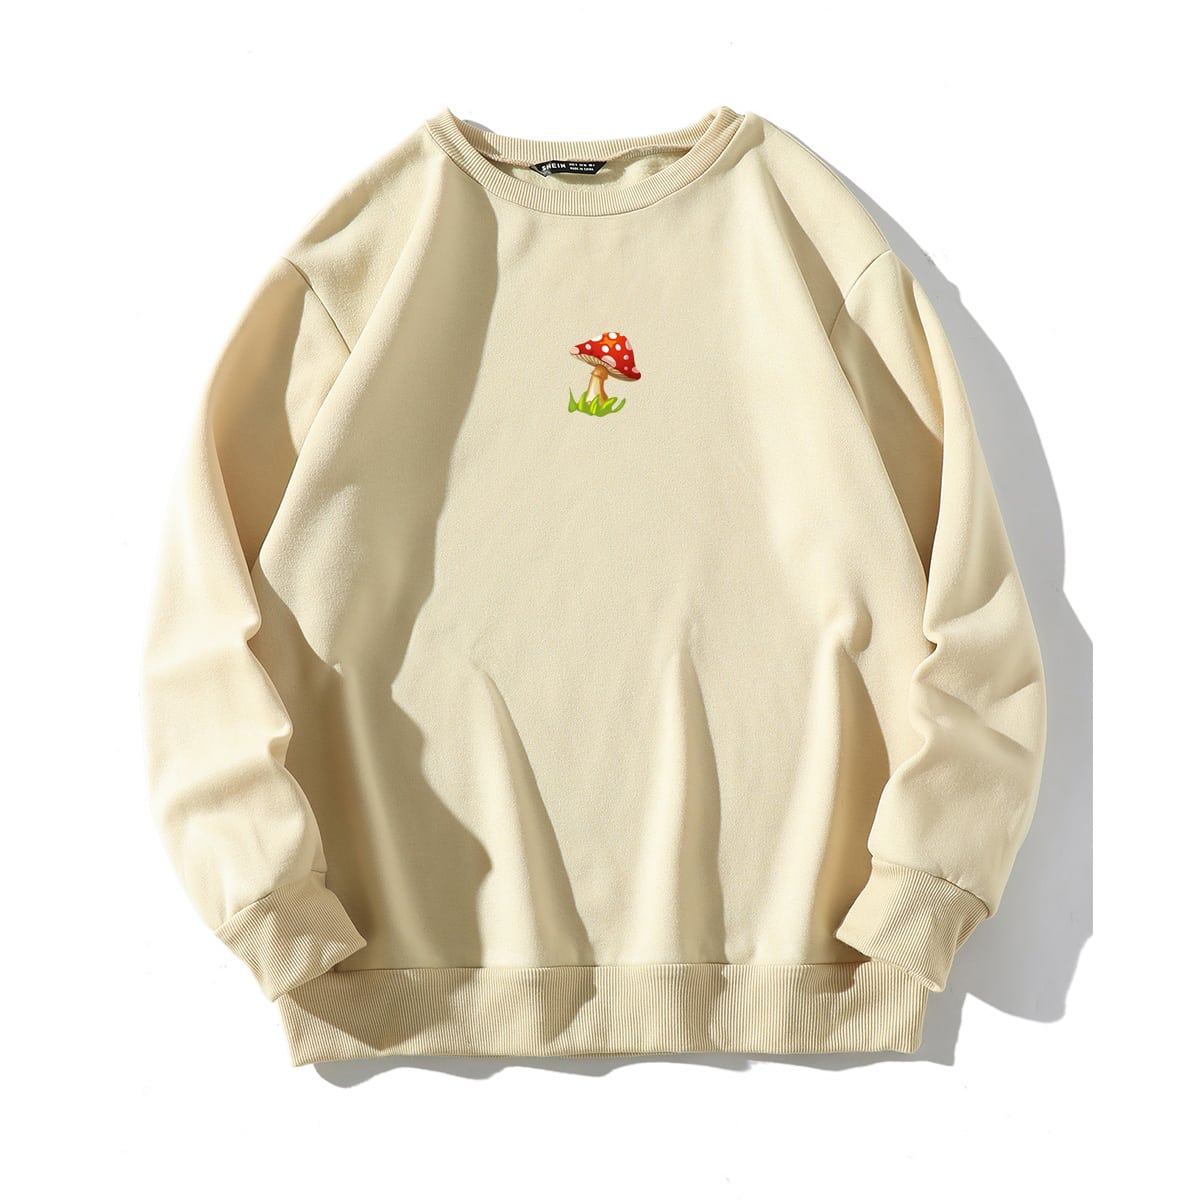 Mushroom Print Round Neck Sweatshirt, SHEIN  - buy with discount